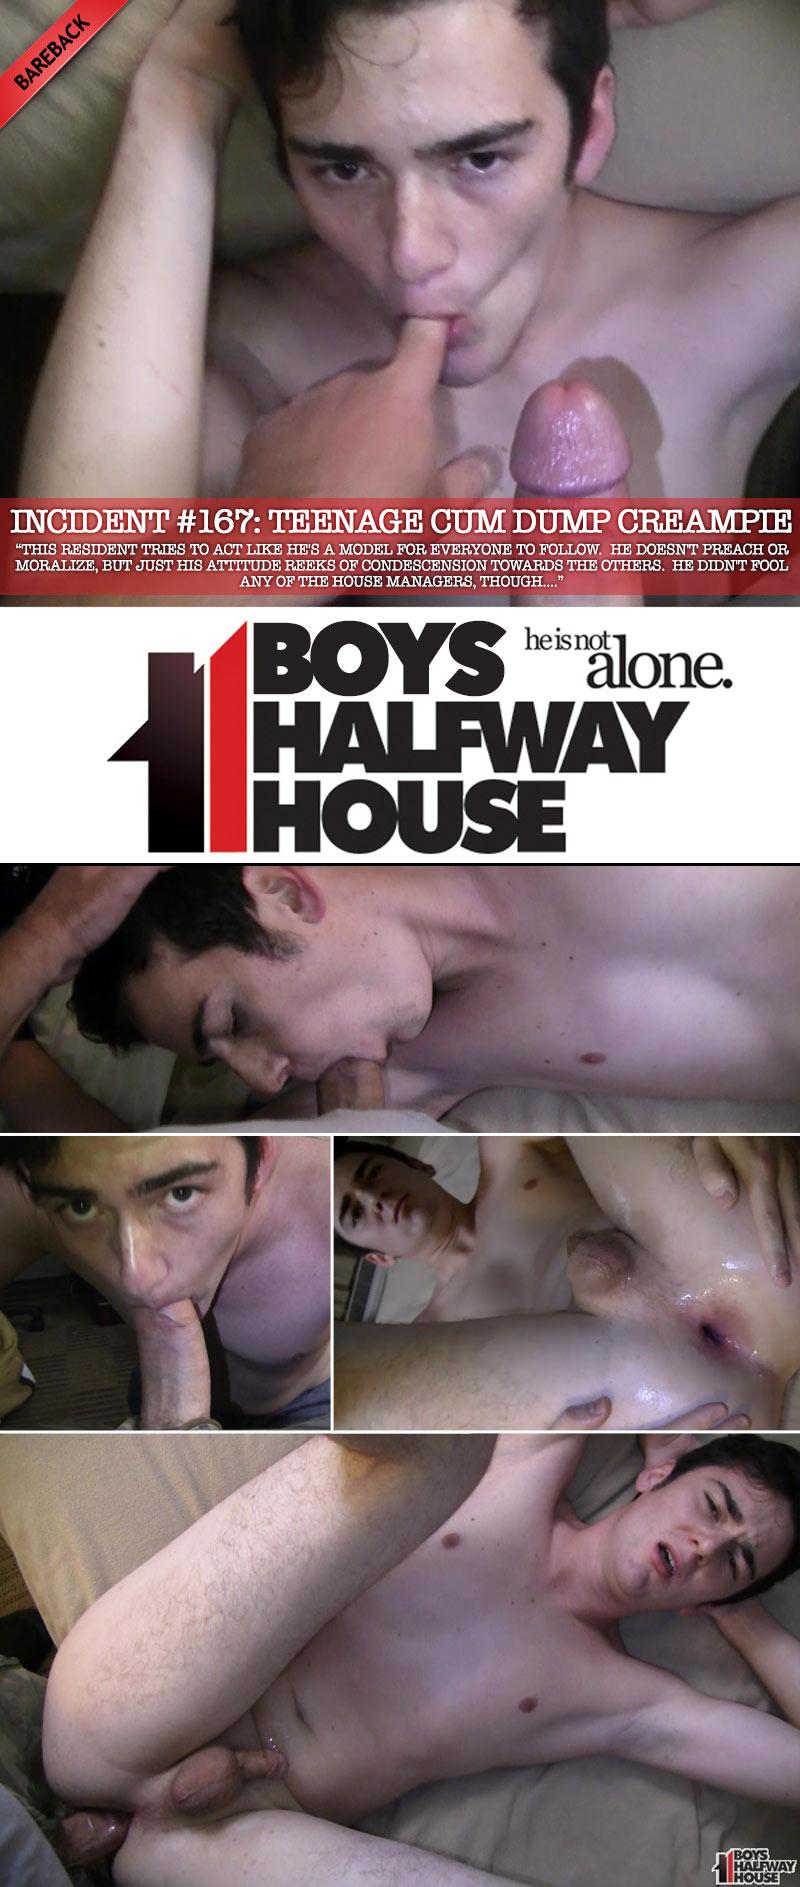 Incident #167: Teenage Cum Dump Creampie (Bareback) at Boys Halfway House